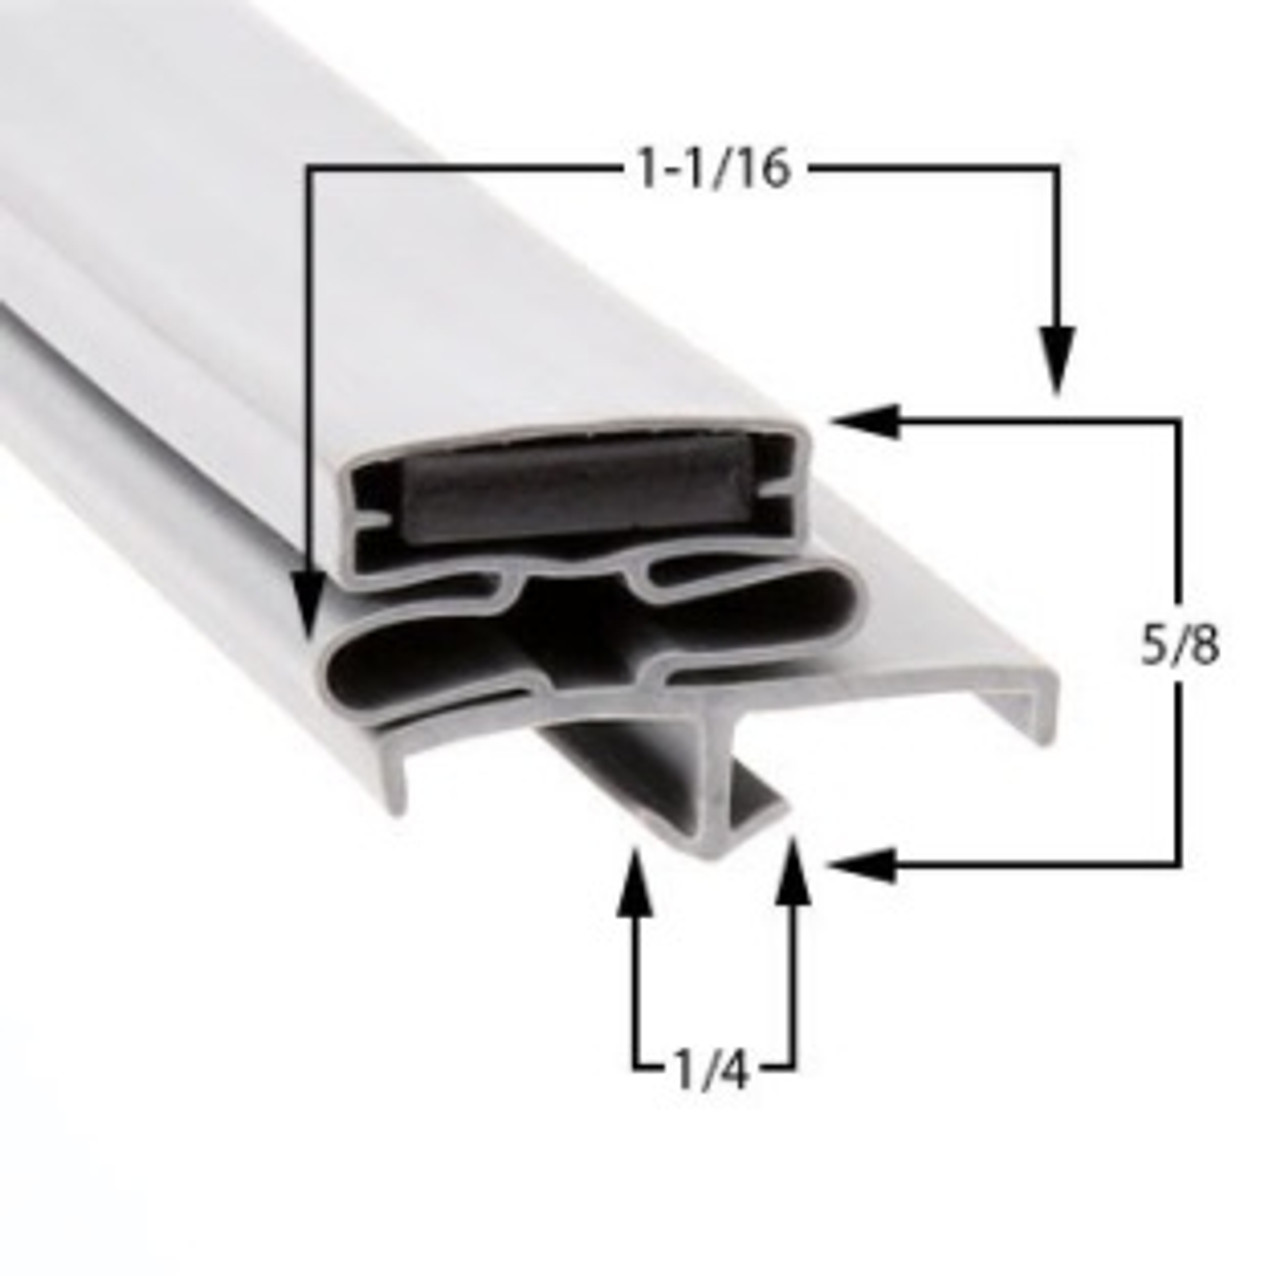 Kolpak Door Gasket Profile 168 22 1/4 x 38 1/4 -2